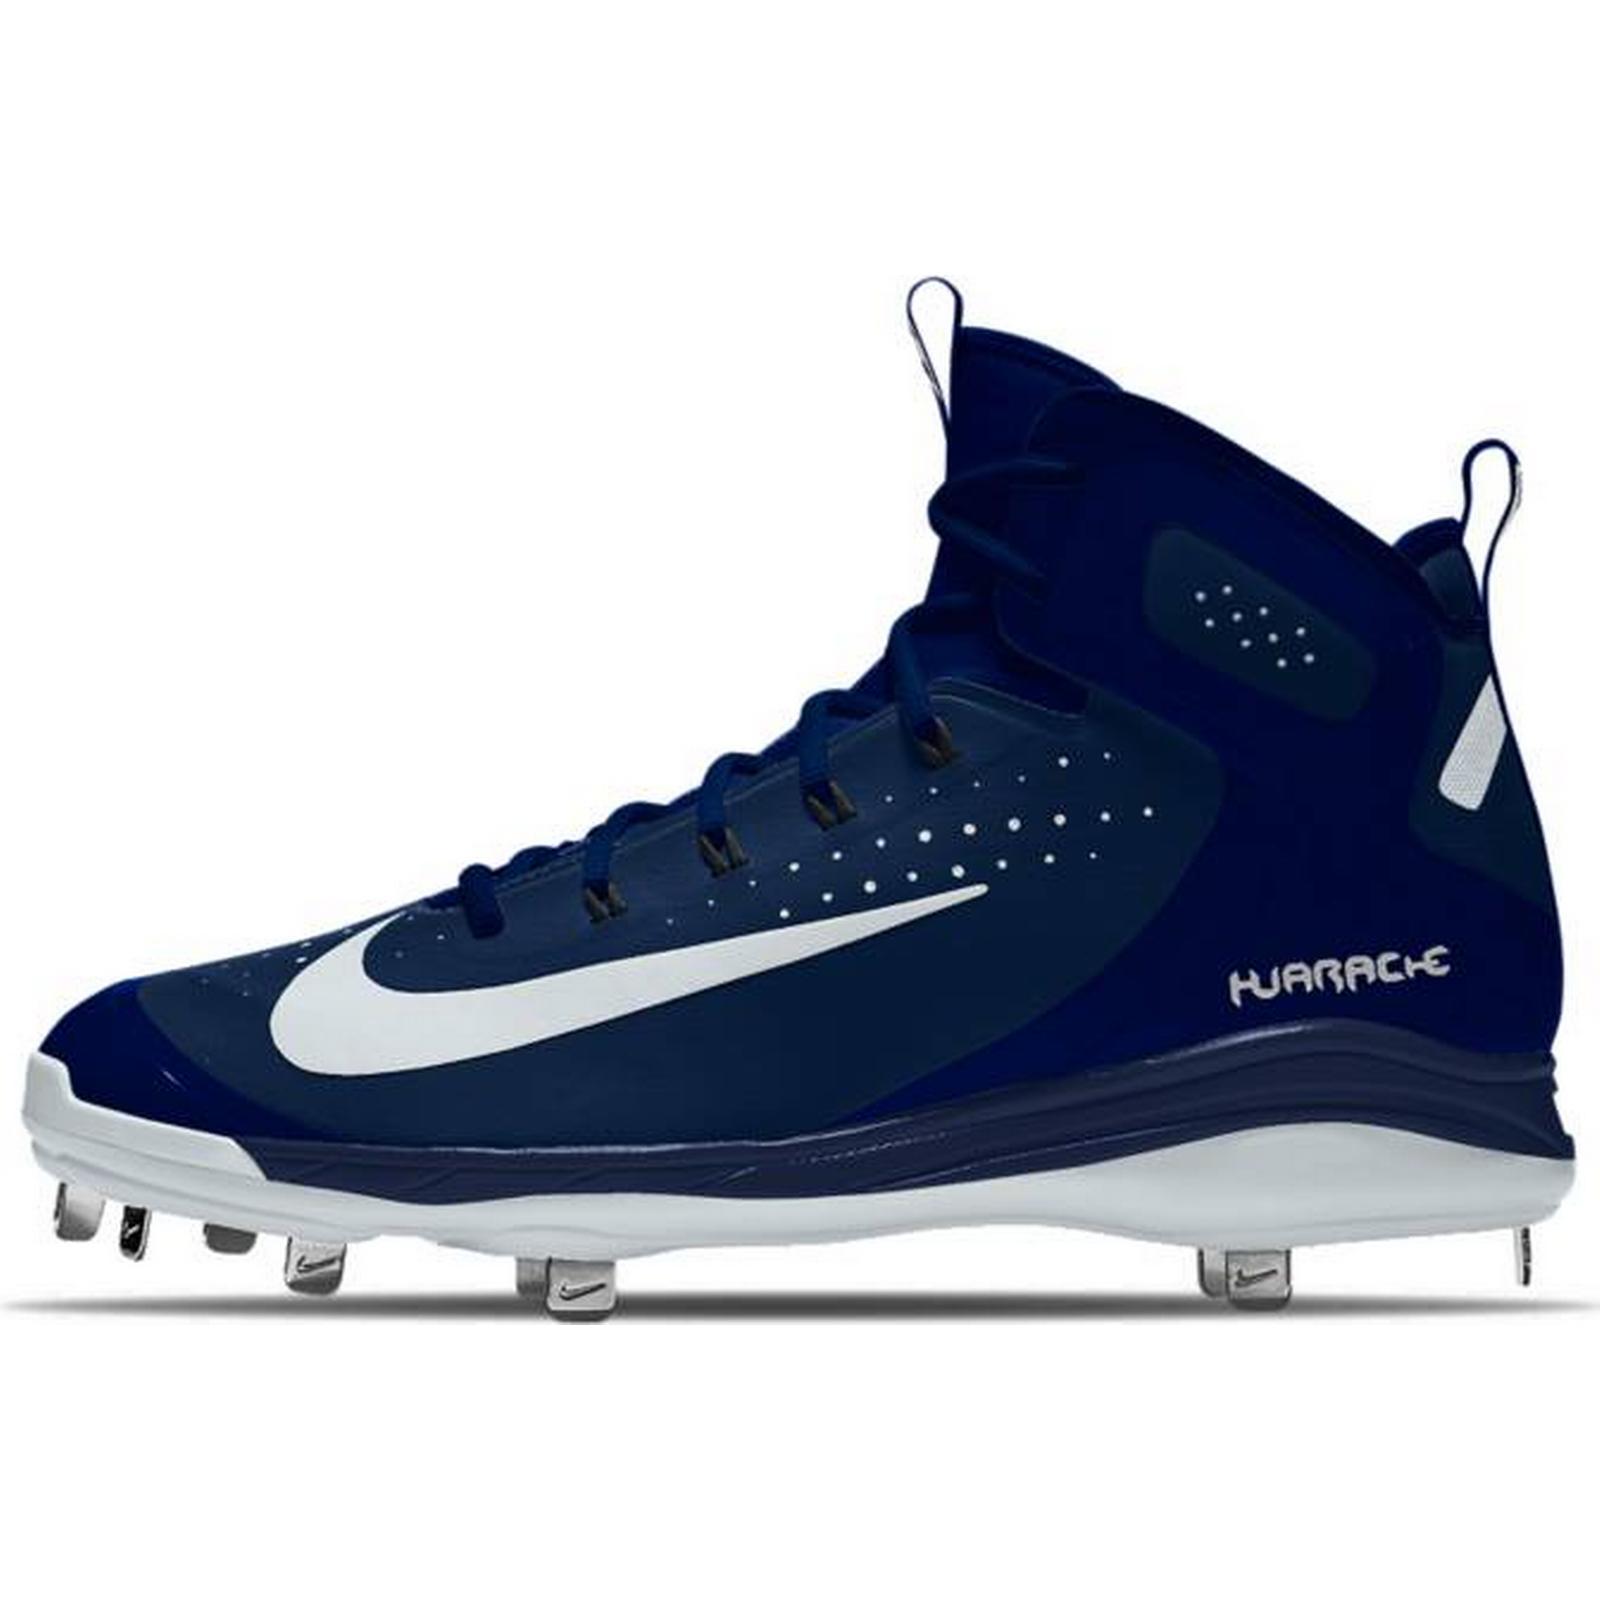 Gentlemen/Ladies : NIKE Męskie Korki Do Gry W Baseball Nike Metal Alpha Huarache Elite Mid Metal Nike ID : Special Purchase 5a3b7b